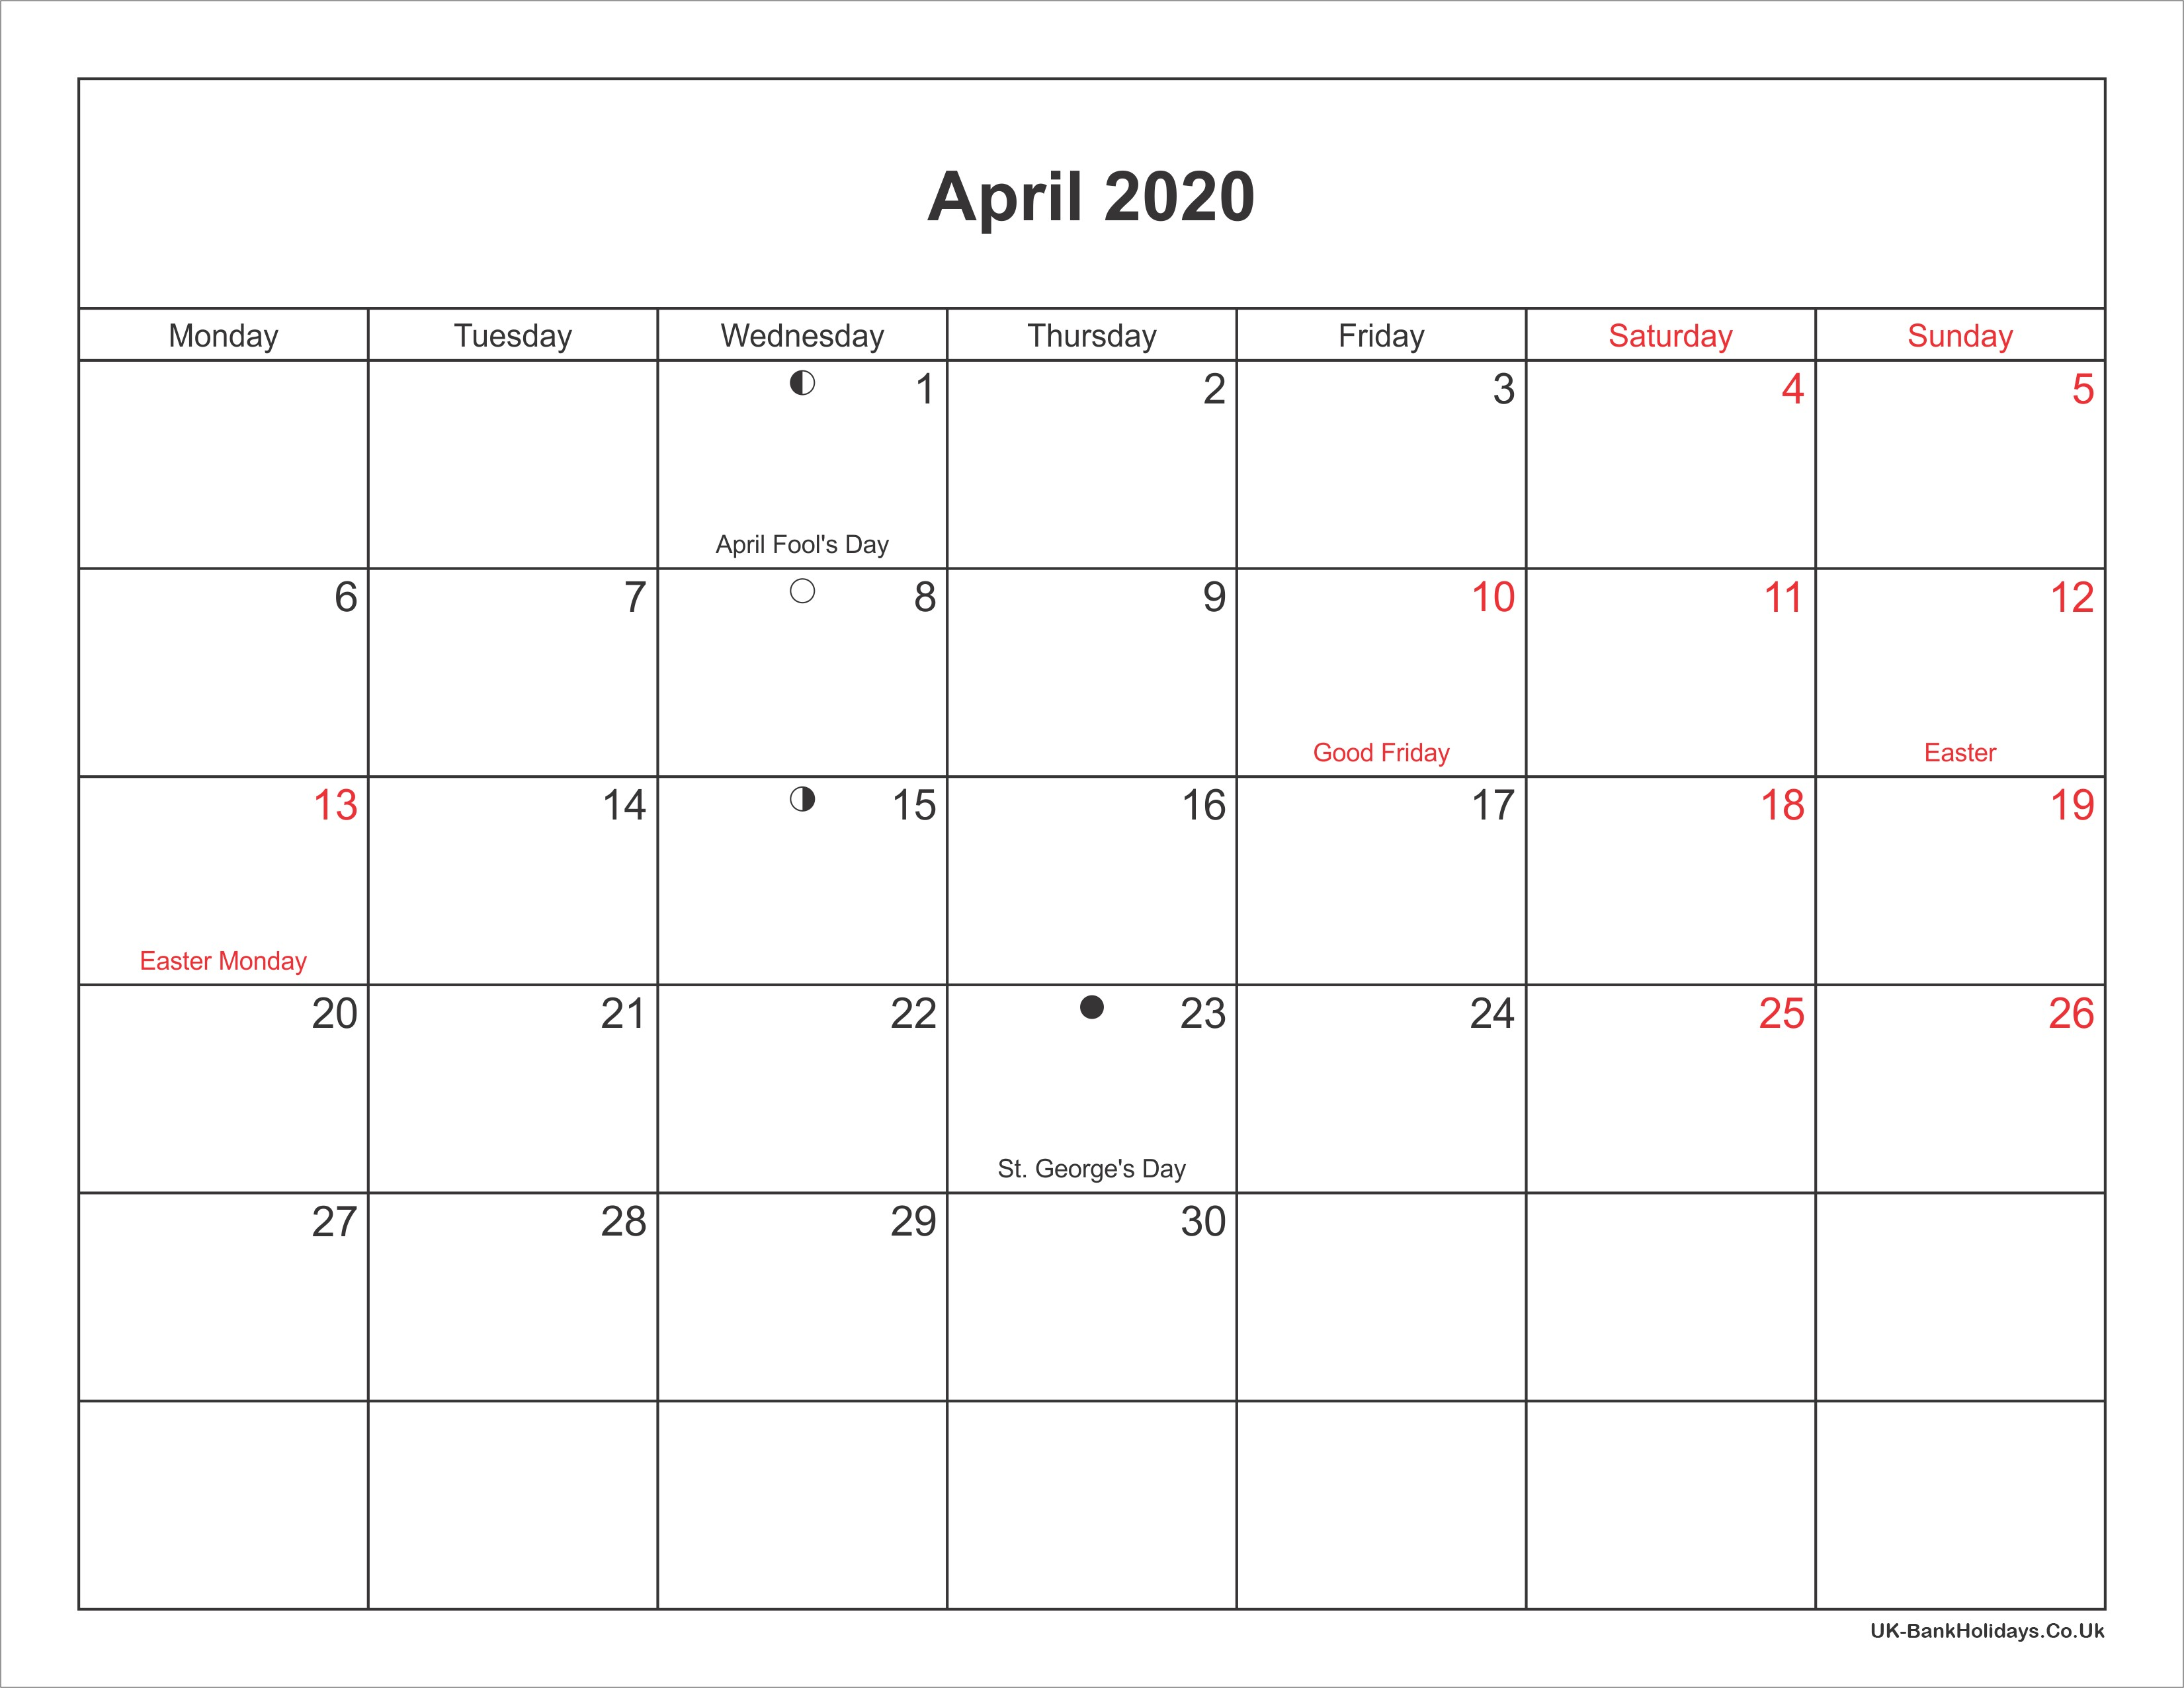 Free Printable 2020 Calendar Pdf April 2020 Calendar Printable with Bank Holidays Uk